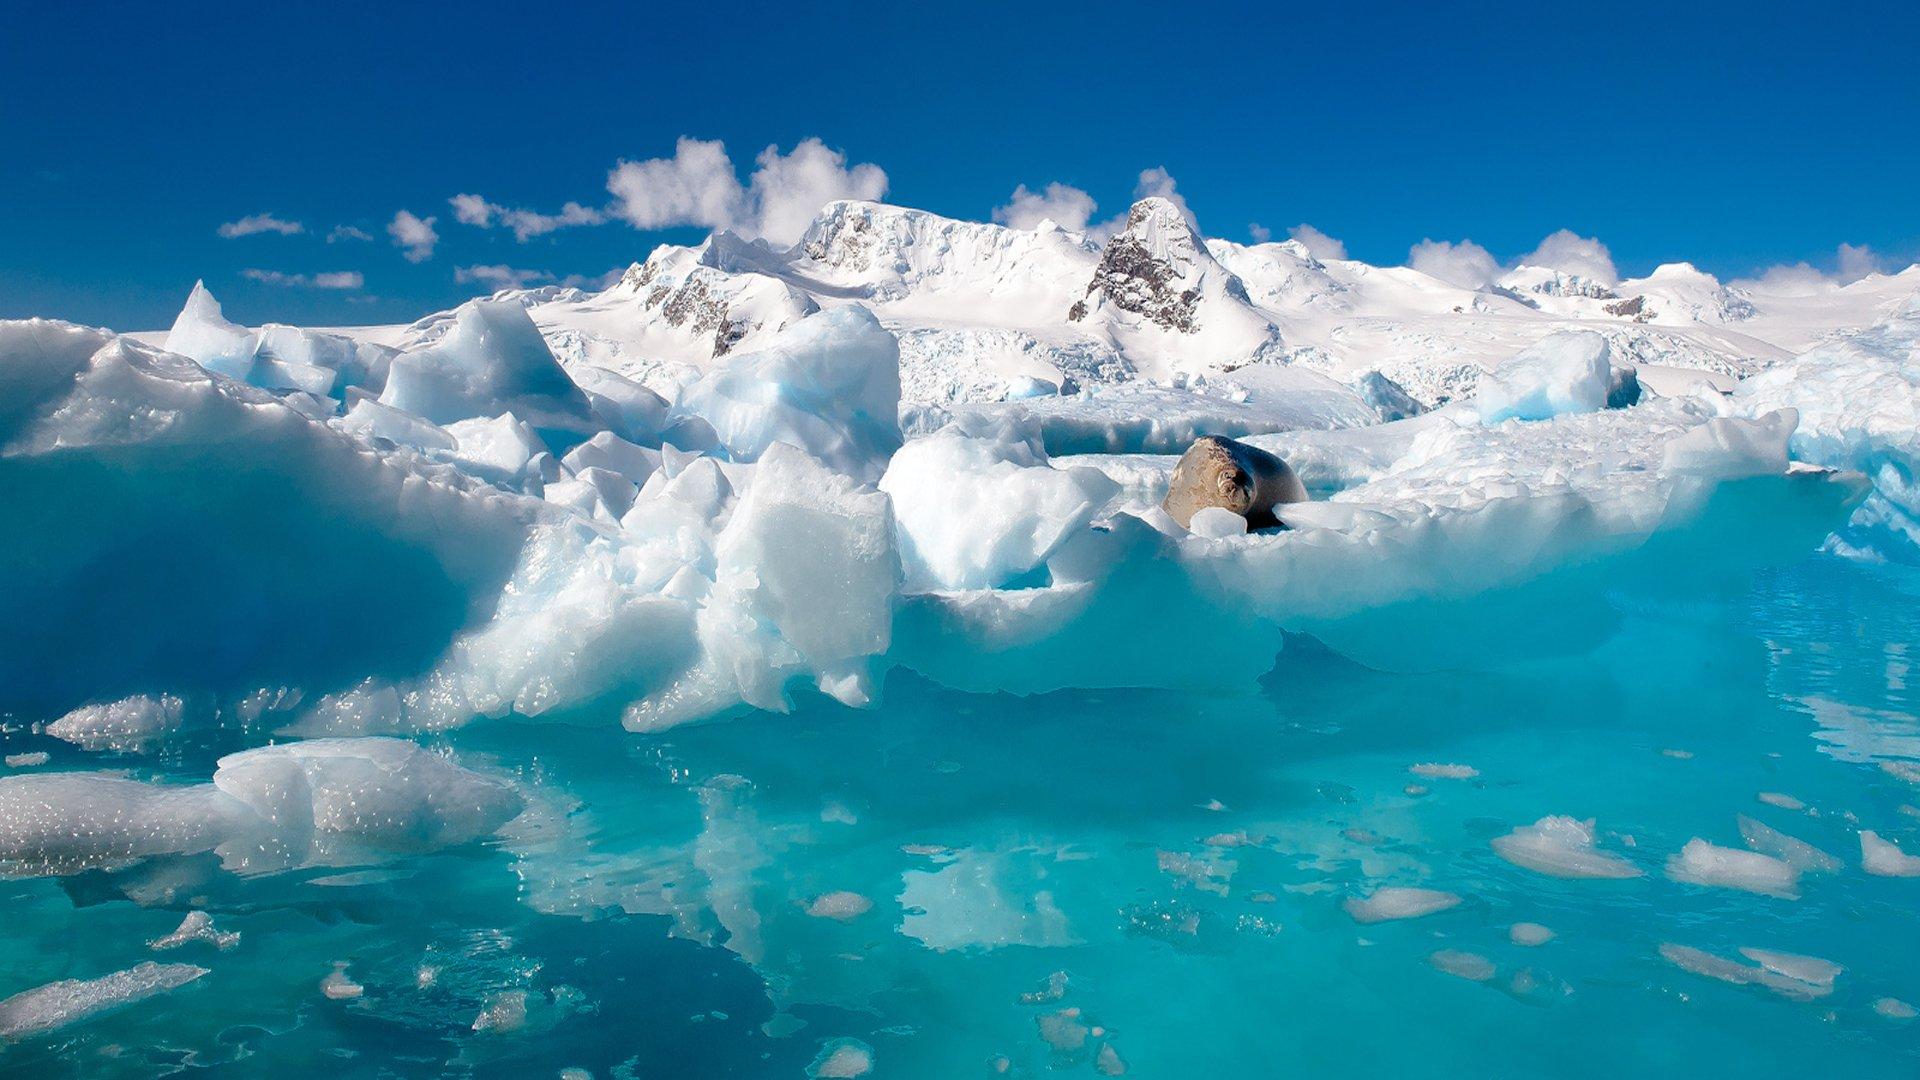 cool nature Antarctica Backgrounds